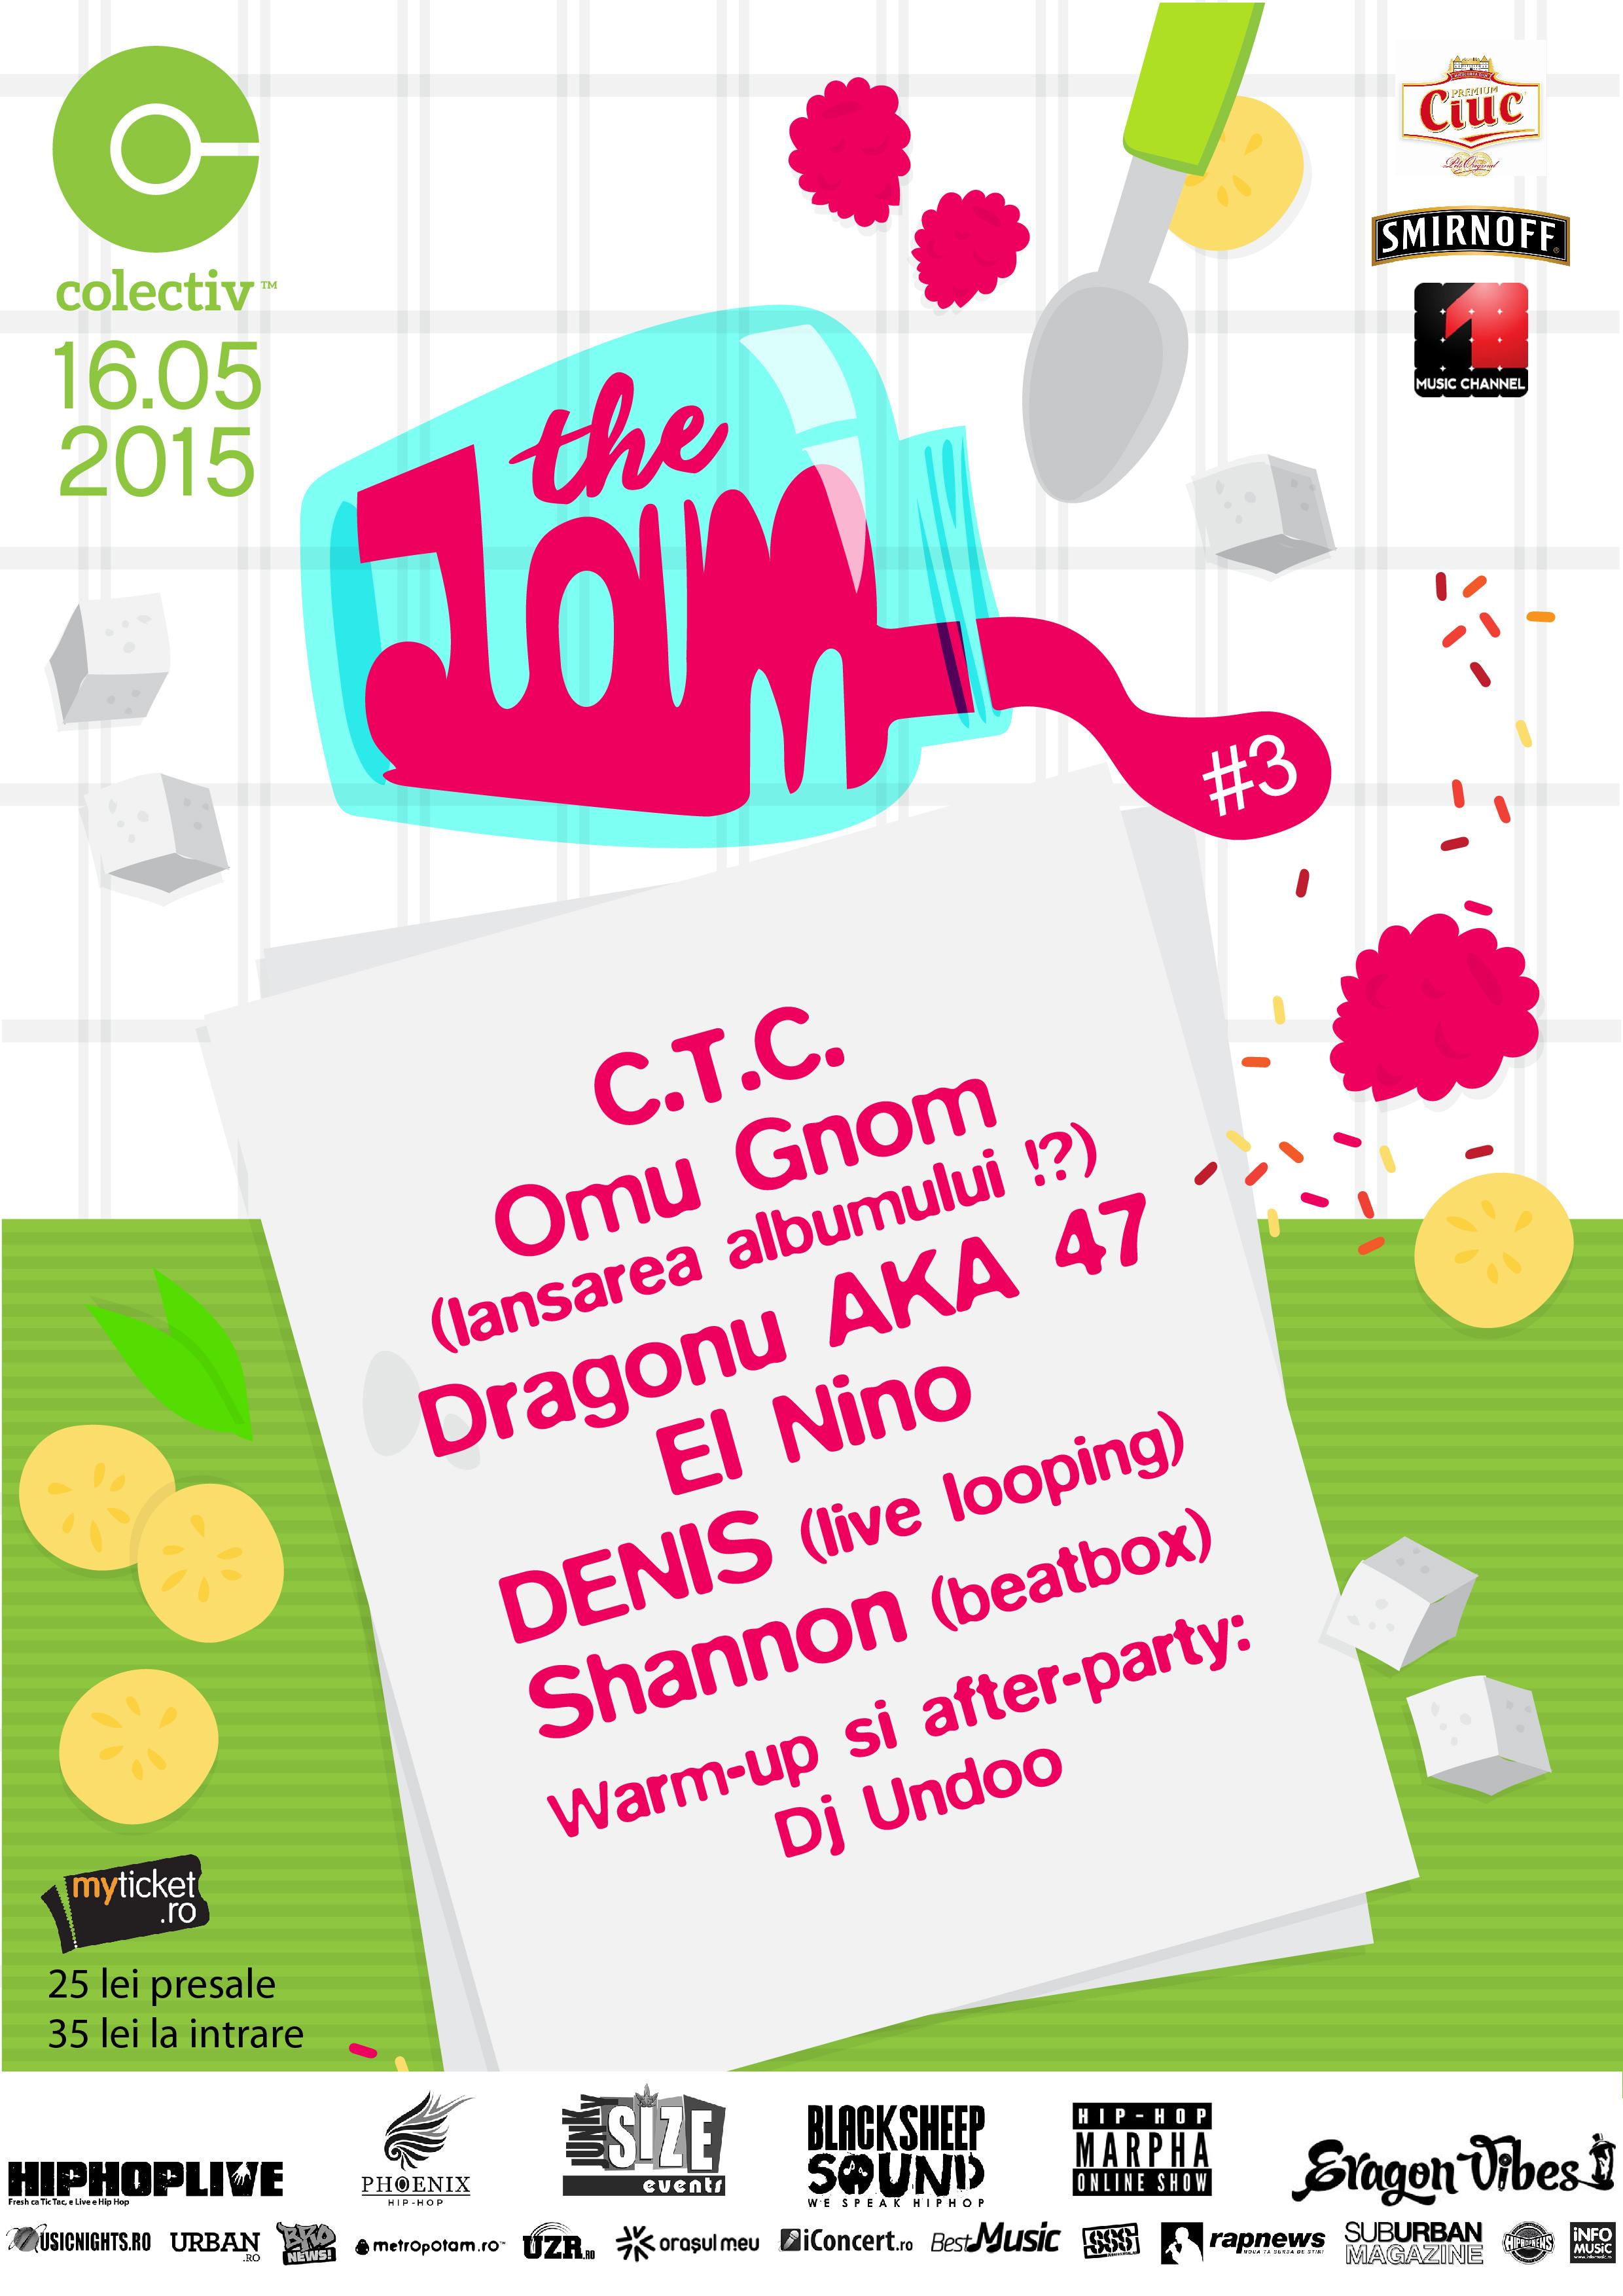 The Jam #3